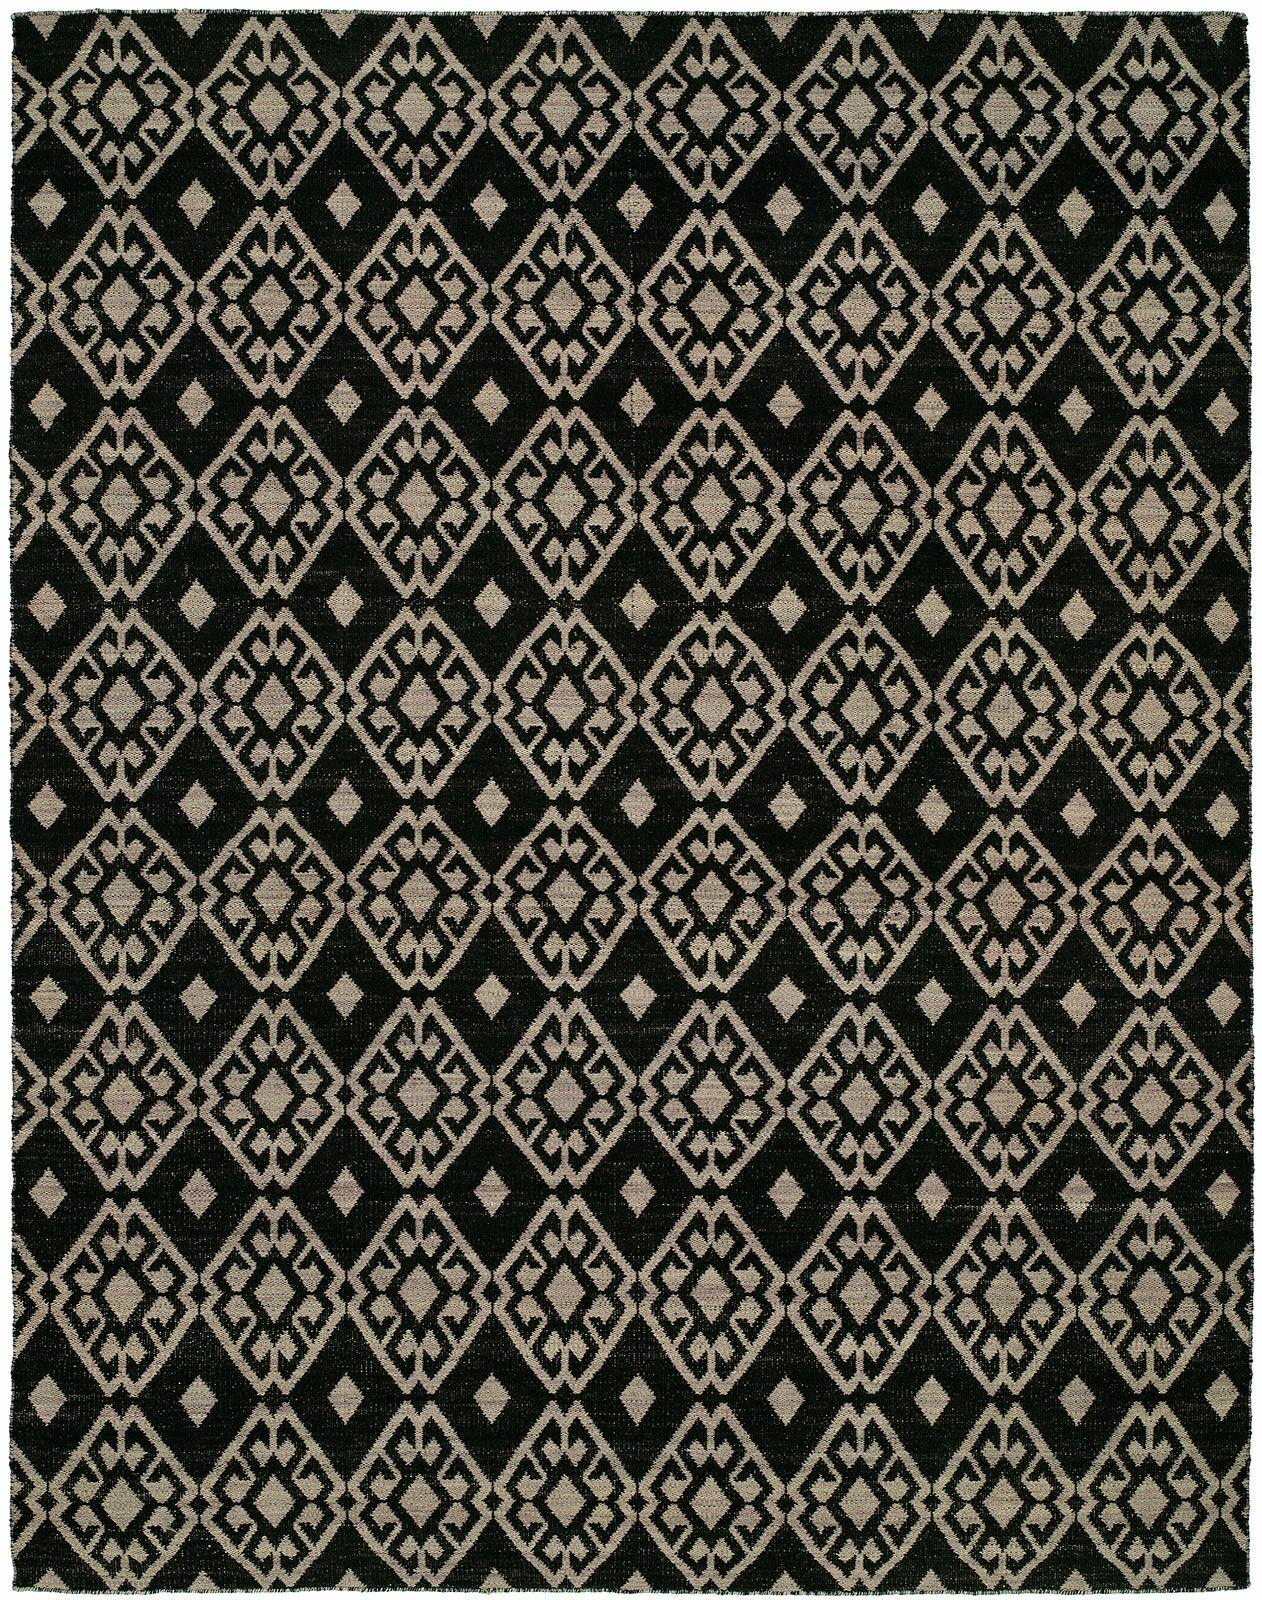 Folsom Handmade Black/Lilac Area Rug Rug Size: 9' x 12'